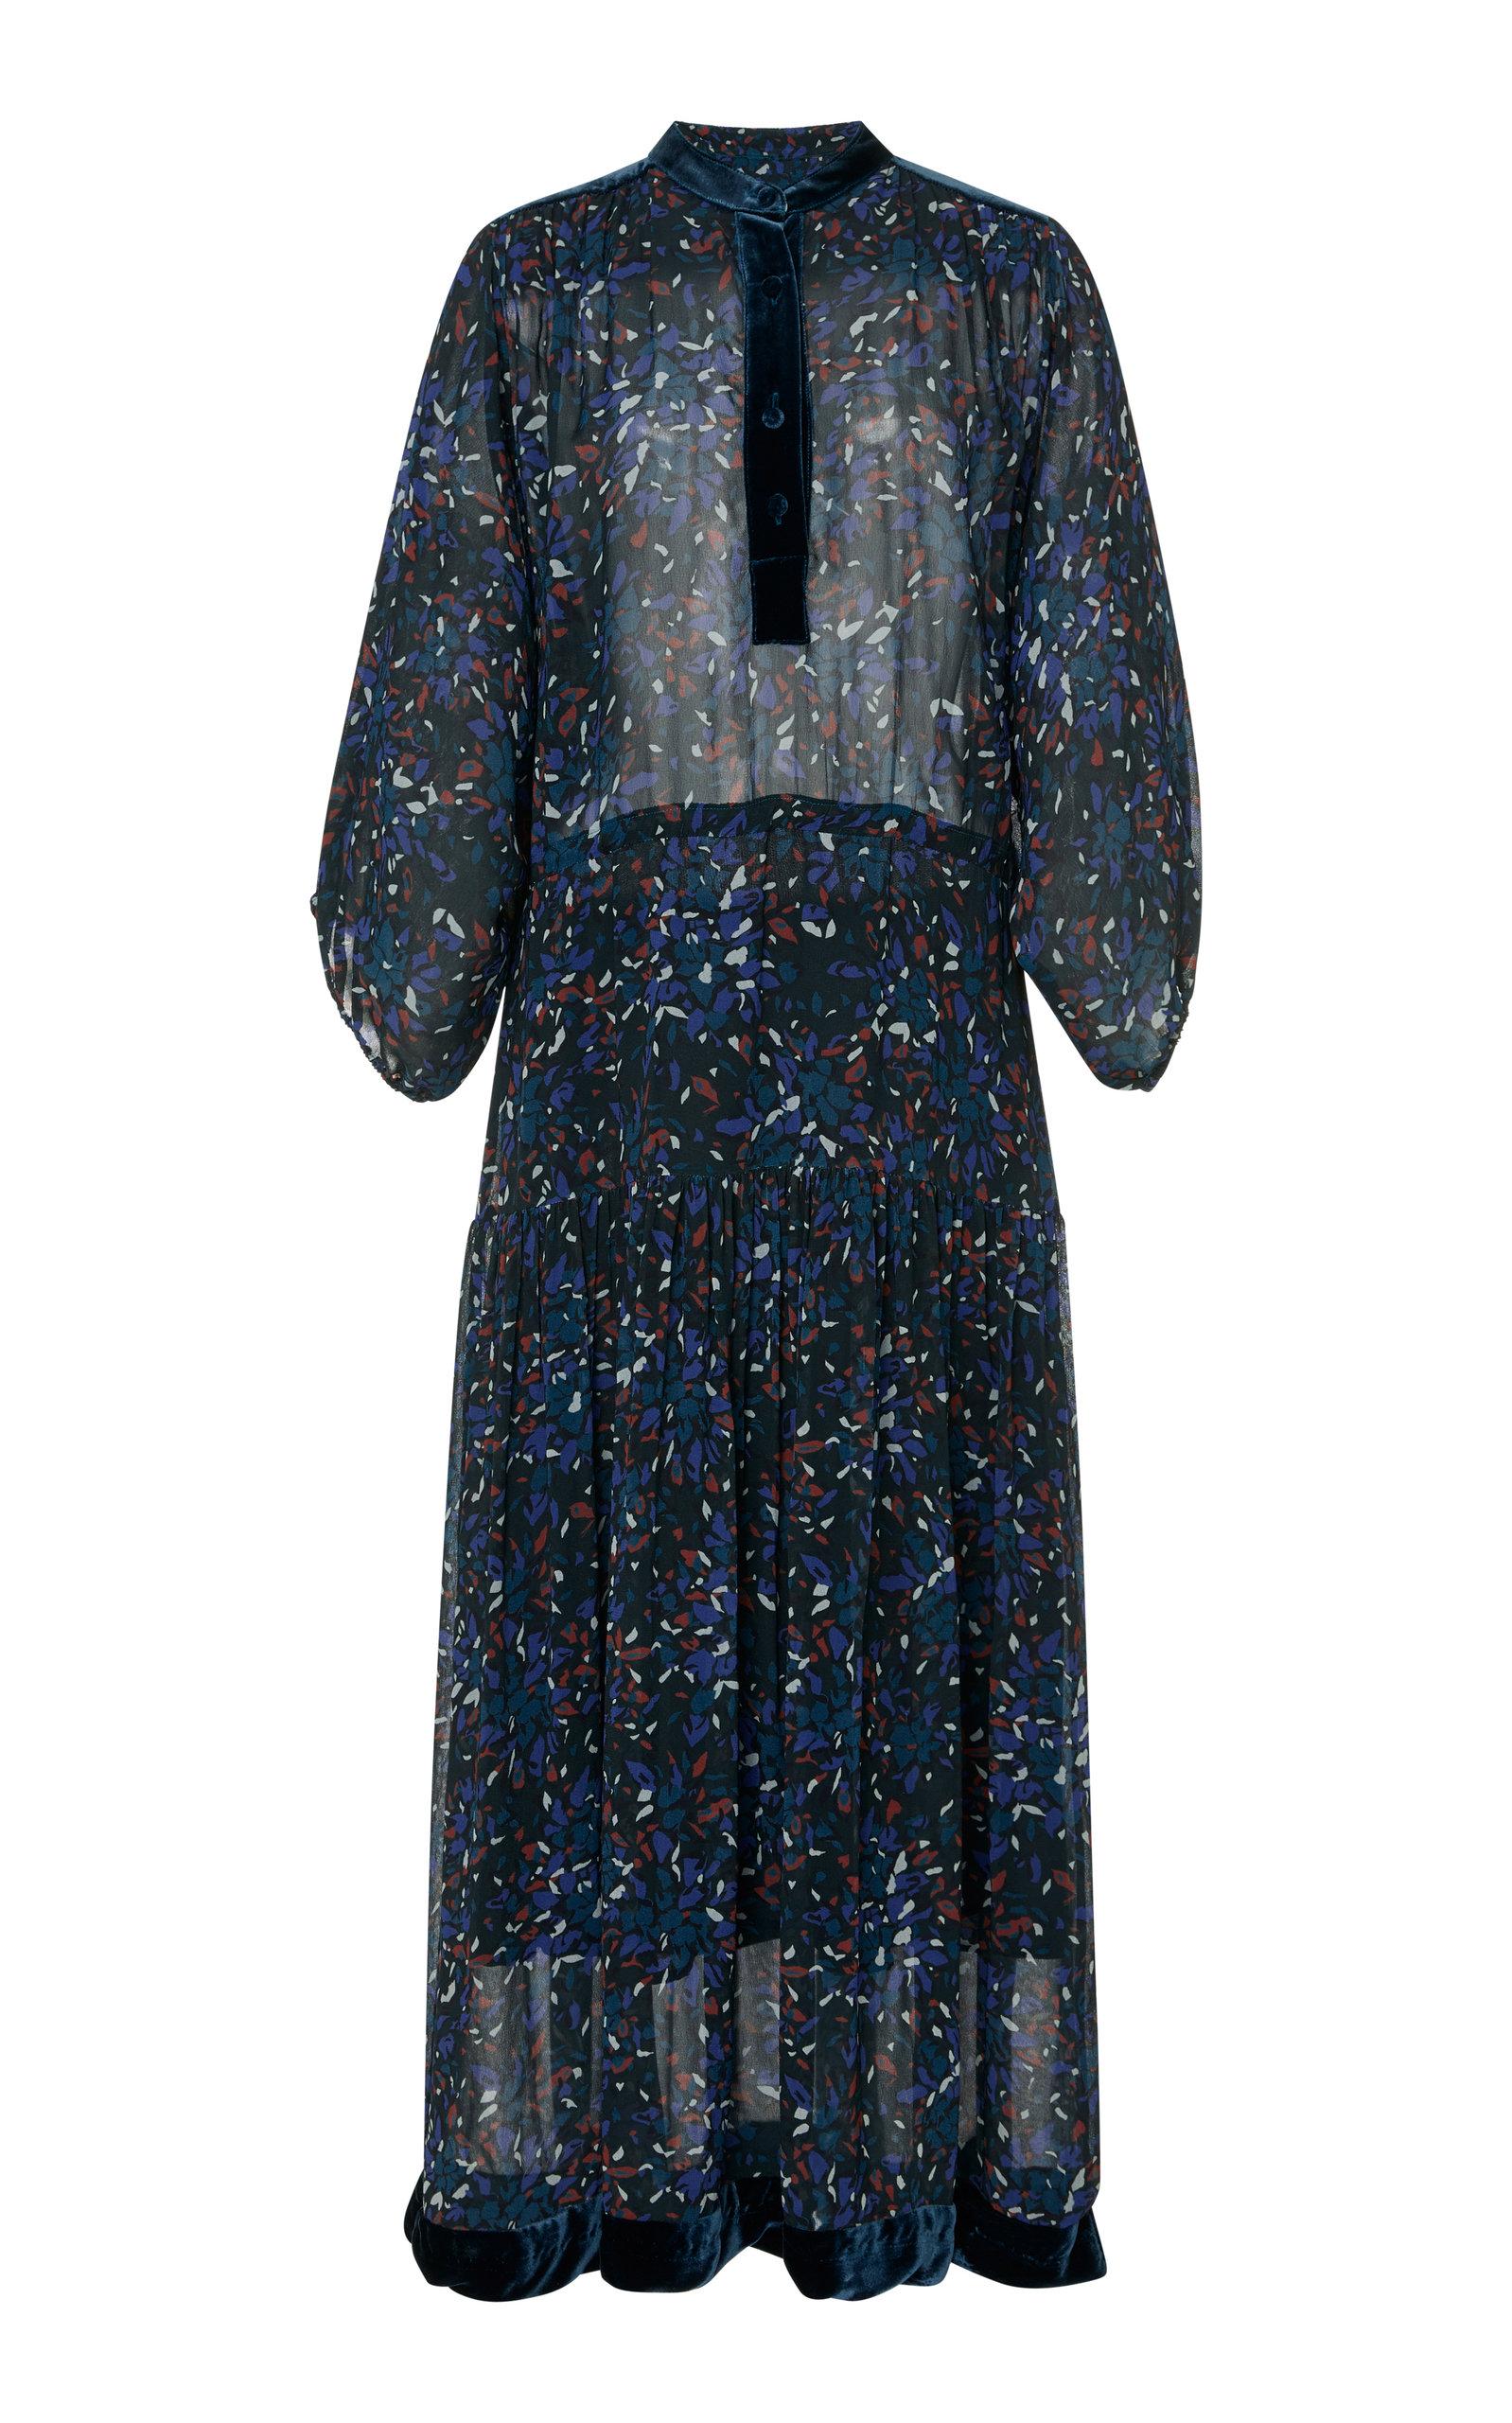 WARM PRIMROSE VELVET-TRIMMED PRINTED CHIFFON MAXI DRESS